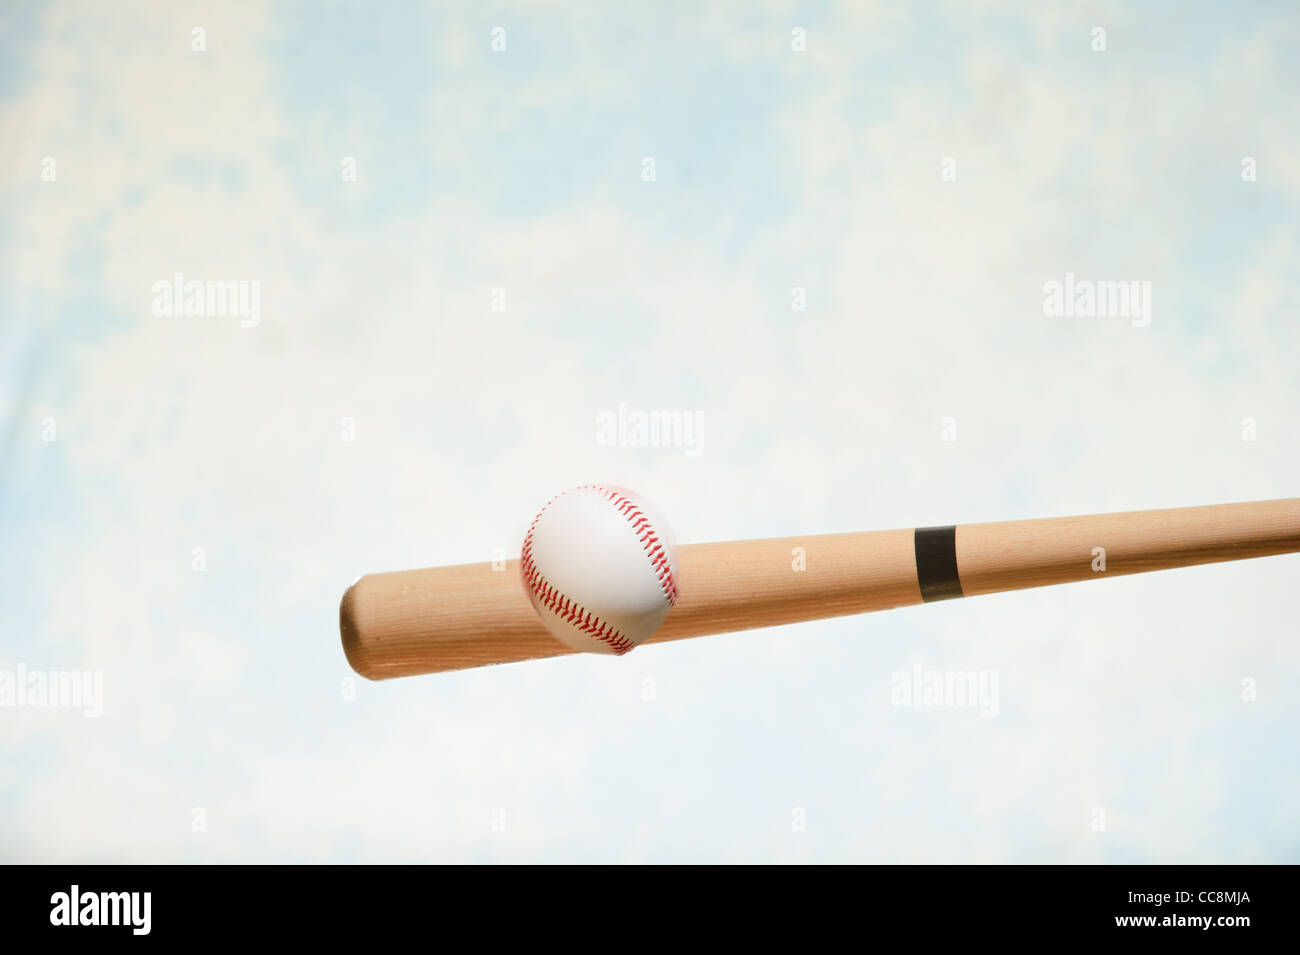 Enjoying a game of baseball - Stock Image